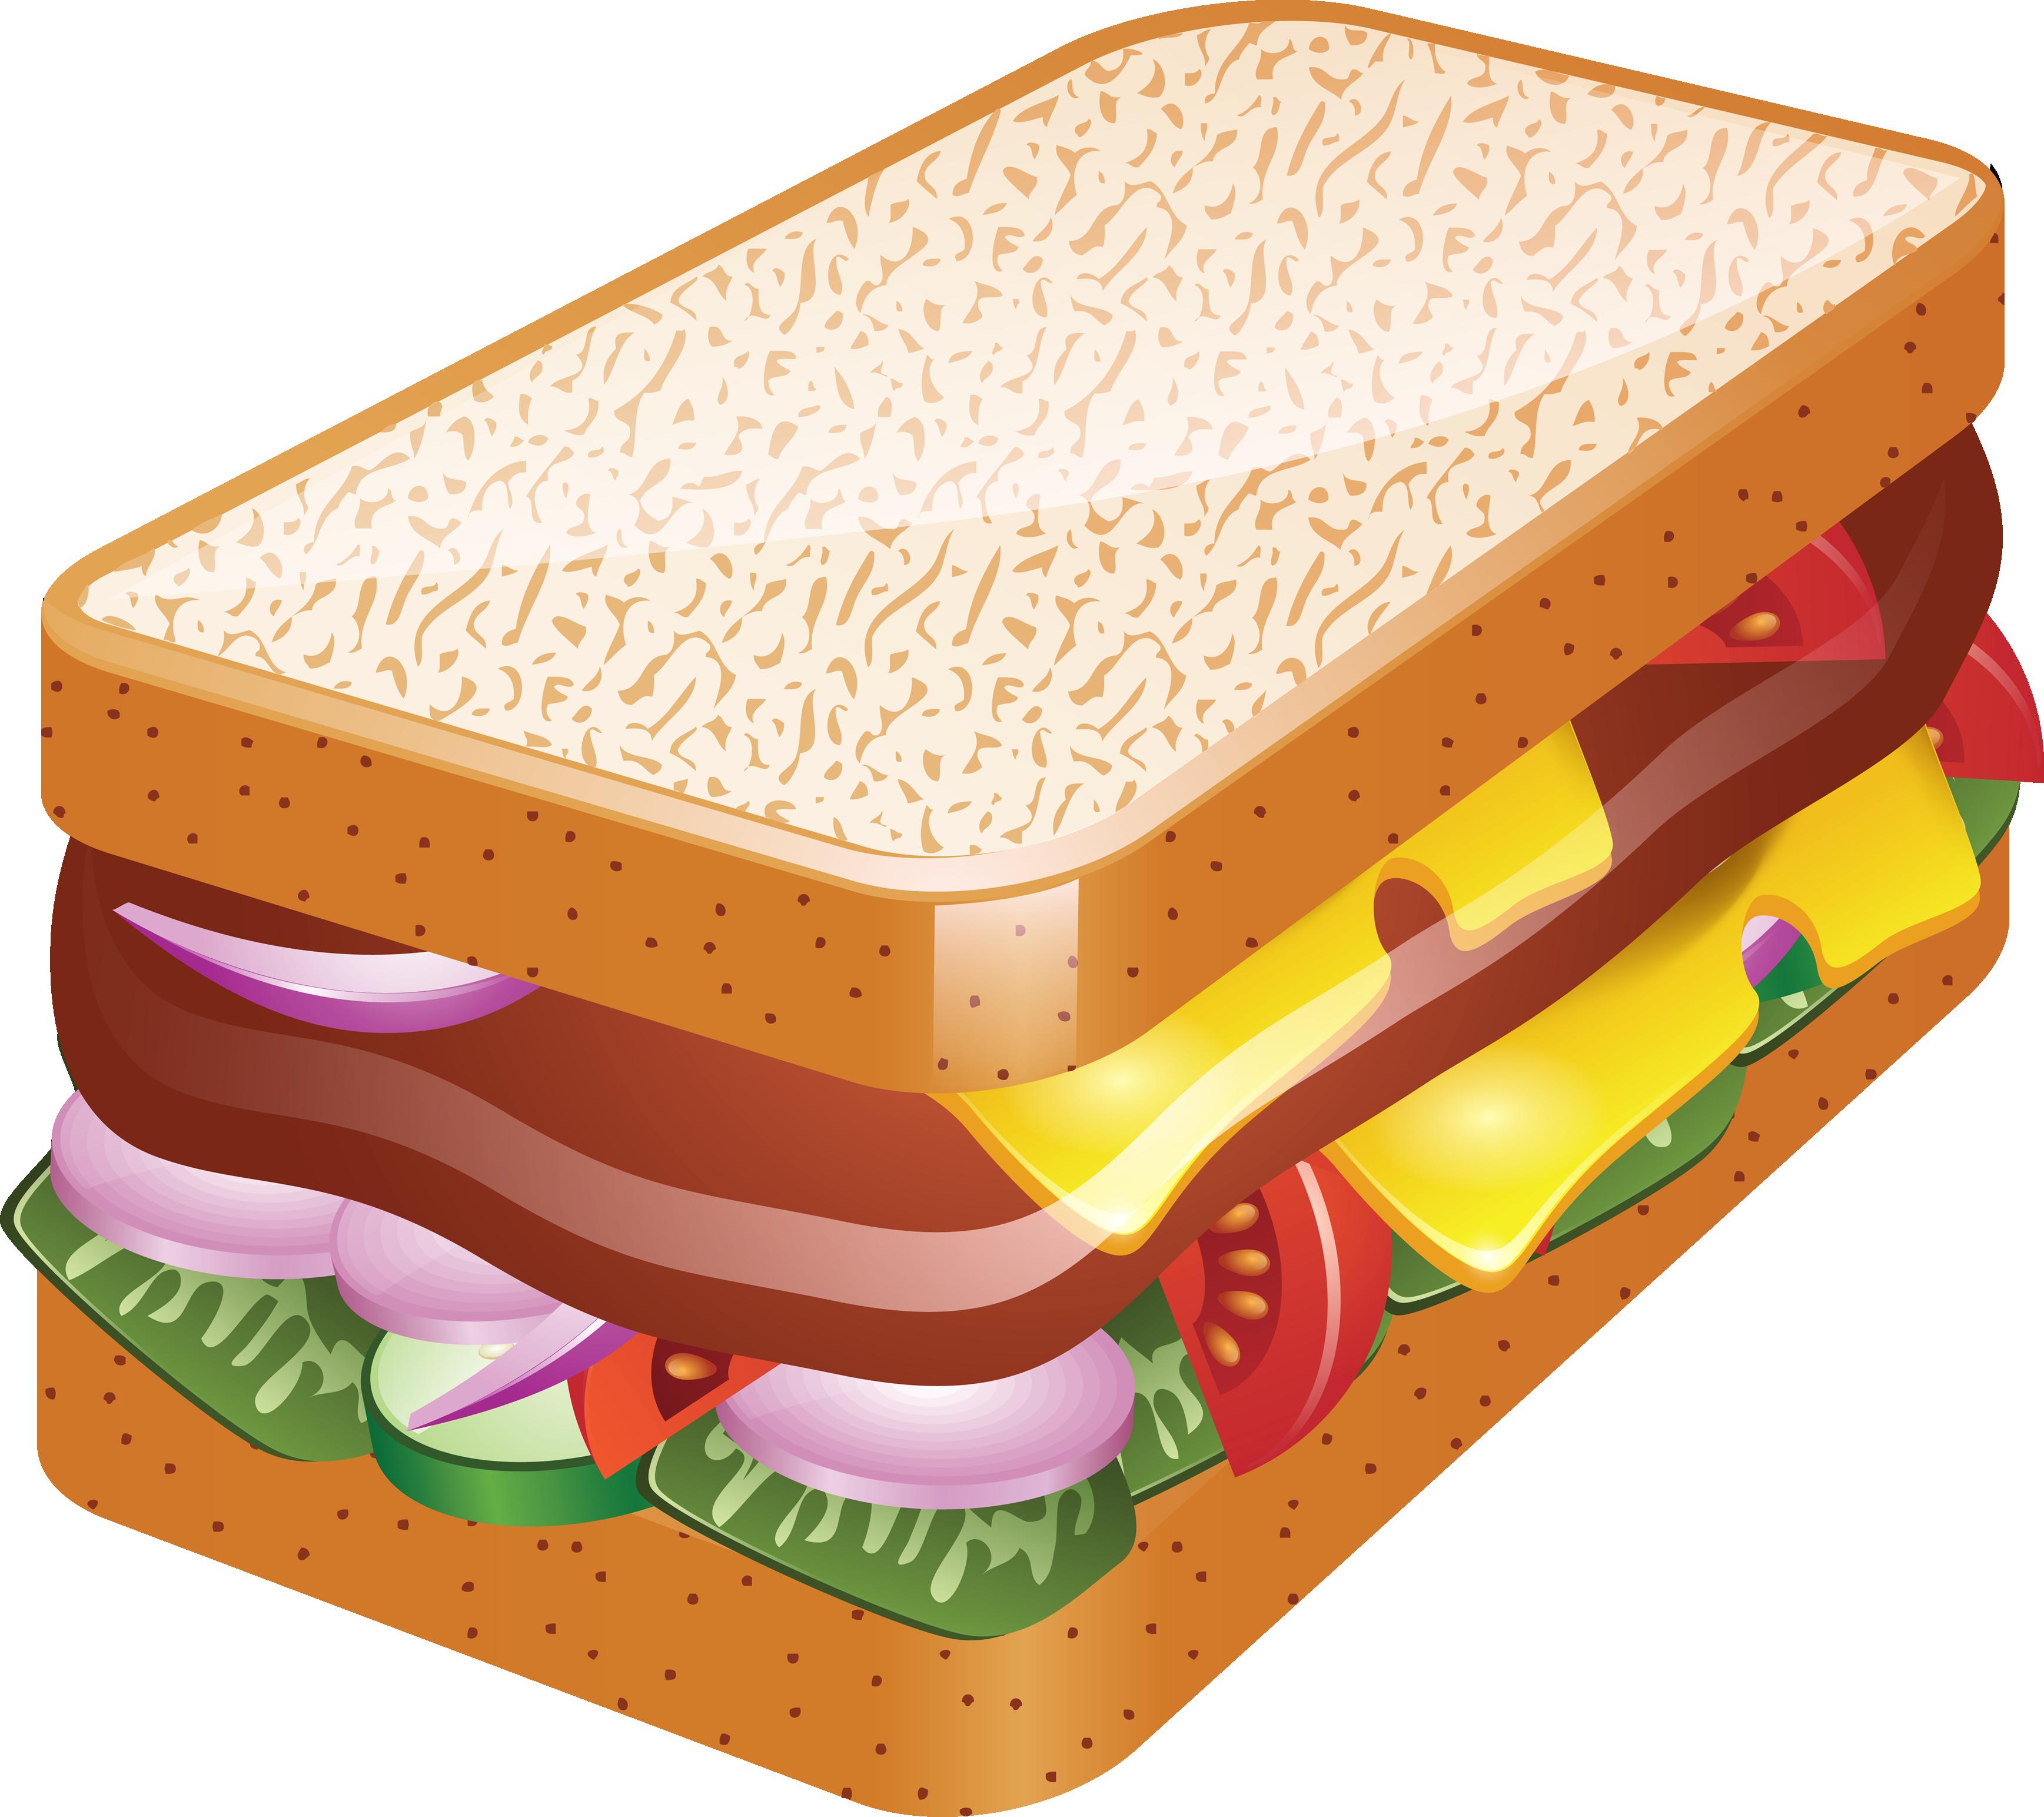 Free Sandwich Cliparts, Download Free Clip Art, Free Clip.